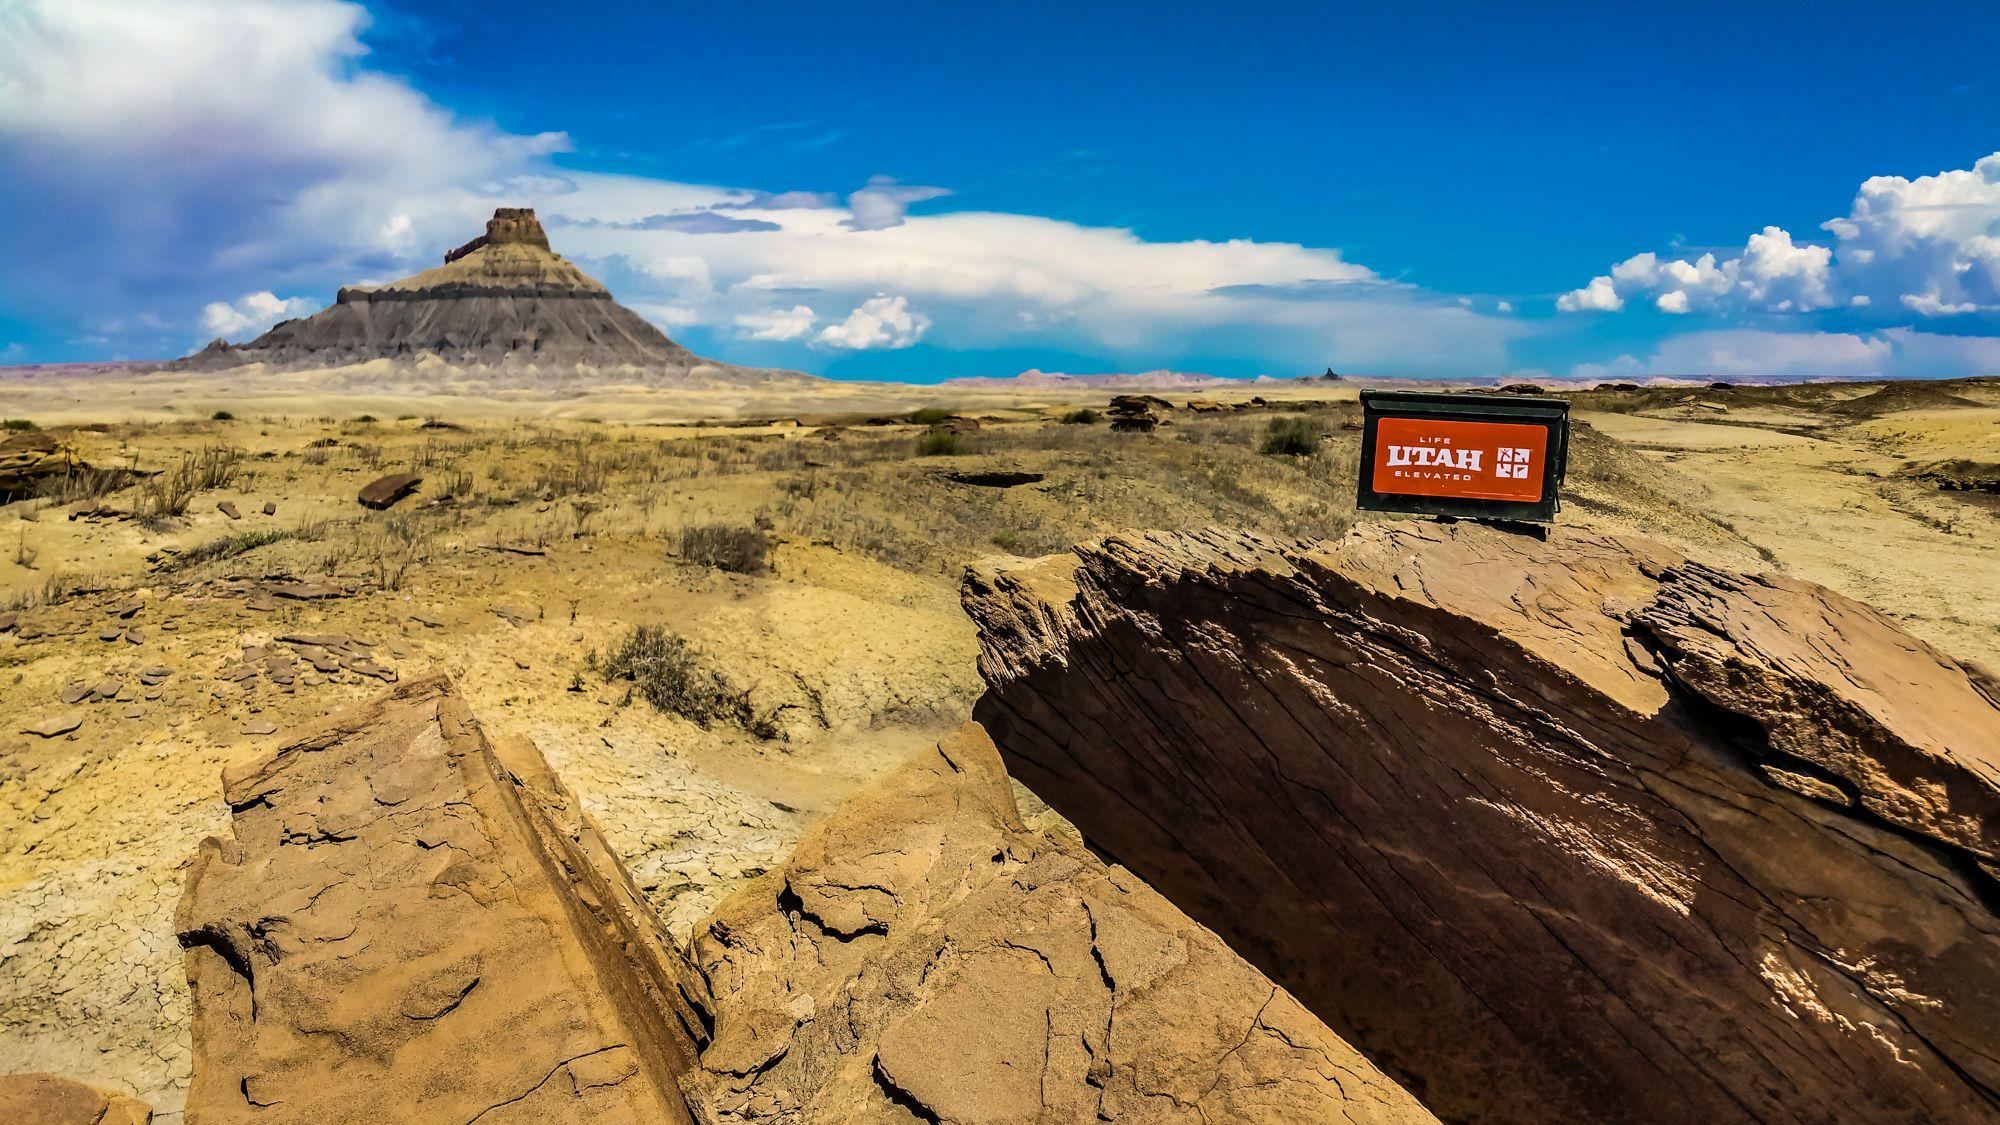 2000 Miles and 4 Days Later – Visit Utah GeoTour